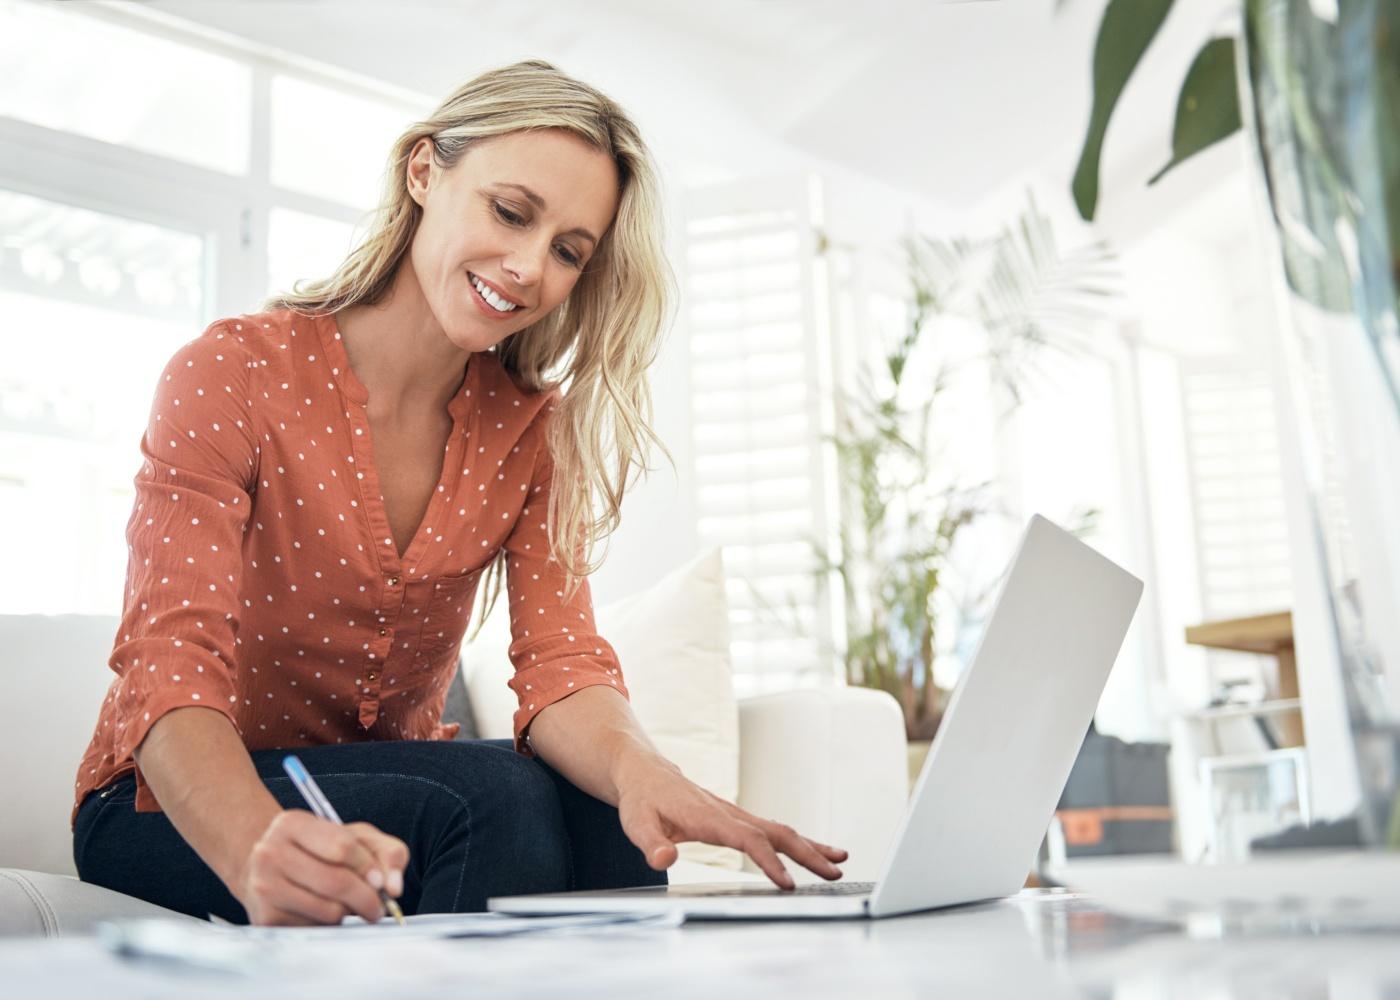 analisar documentos bancários